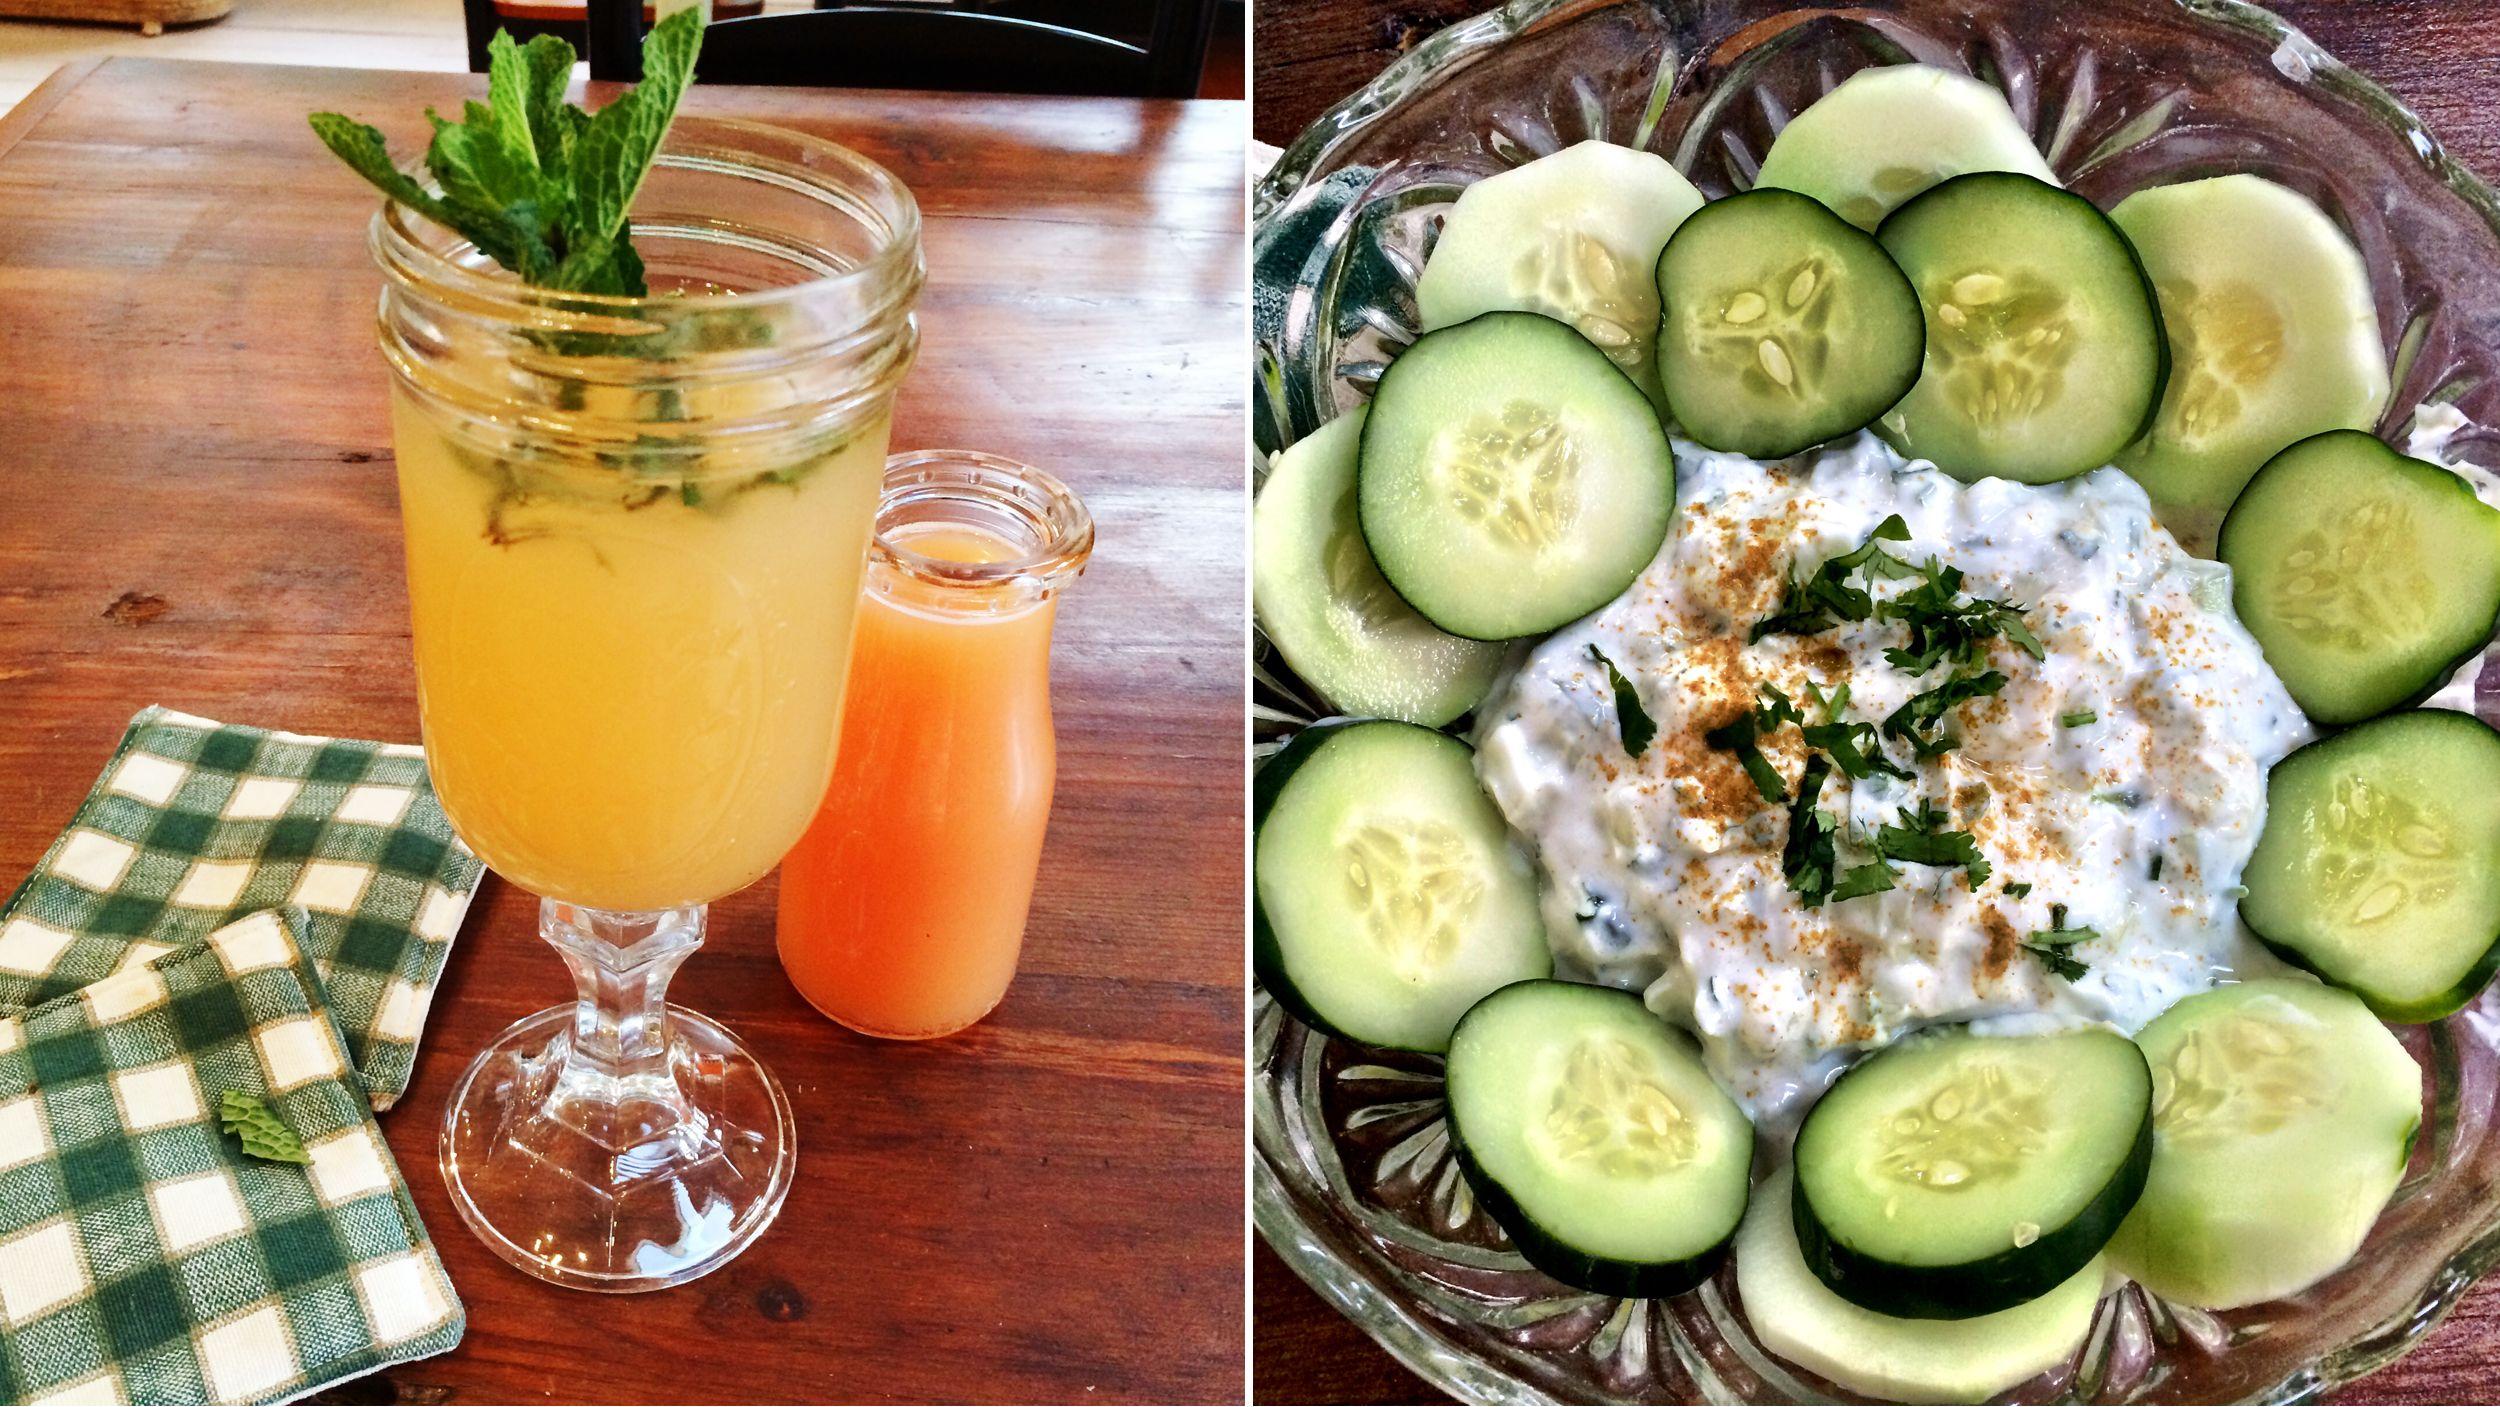 Beat the bloat! Make Joy Bauer's iced tea, cucumber dip